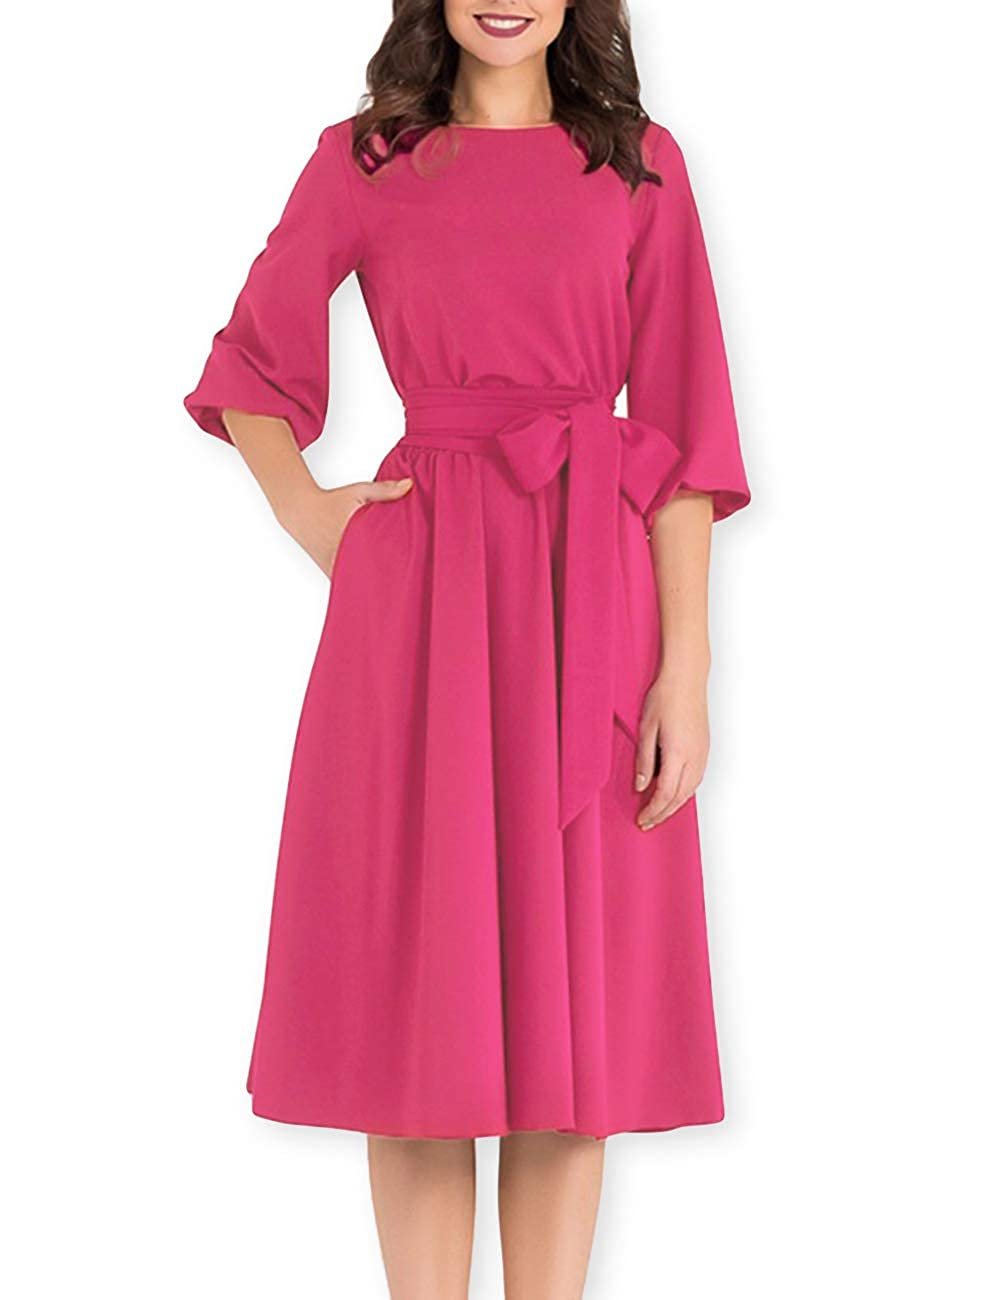 Fuchsia AOOKSMERY Women Elegance Audrey Hepburn Style Round Neck 3 4 Puff Sleeve Puffy Swing Midi Dress with Belt